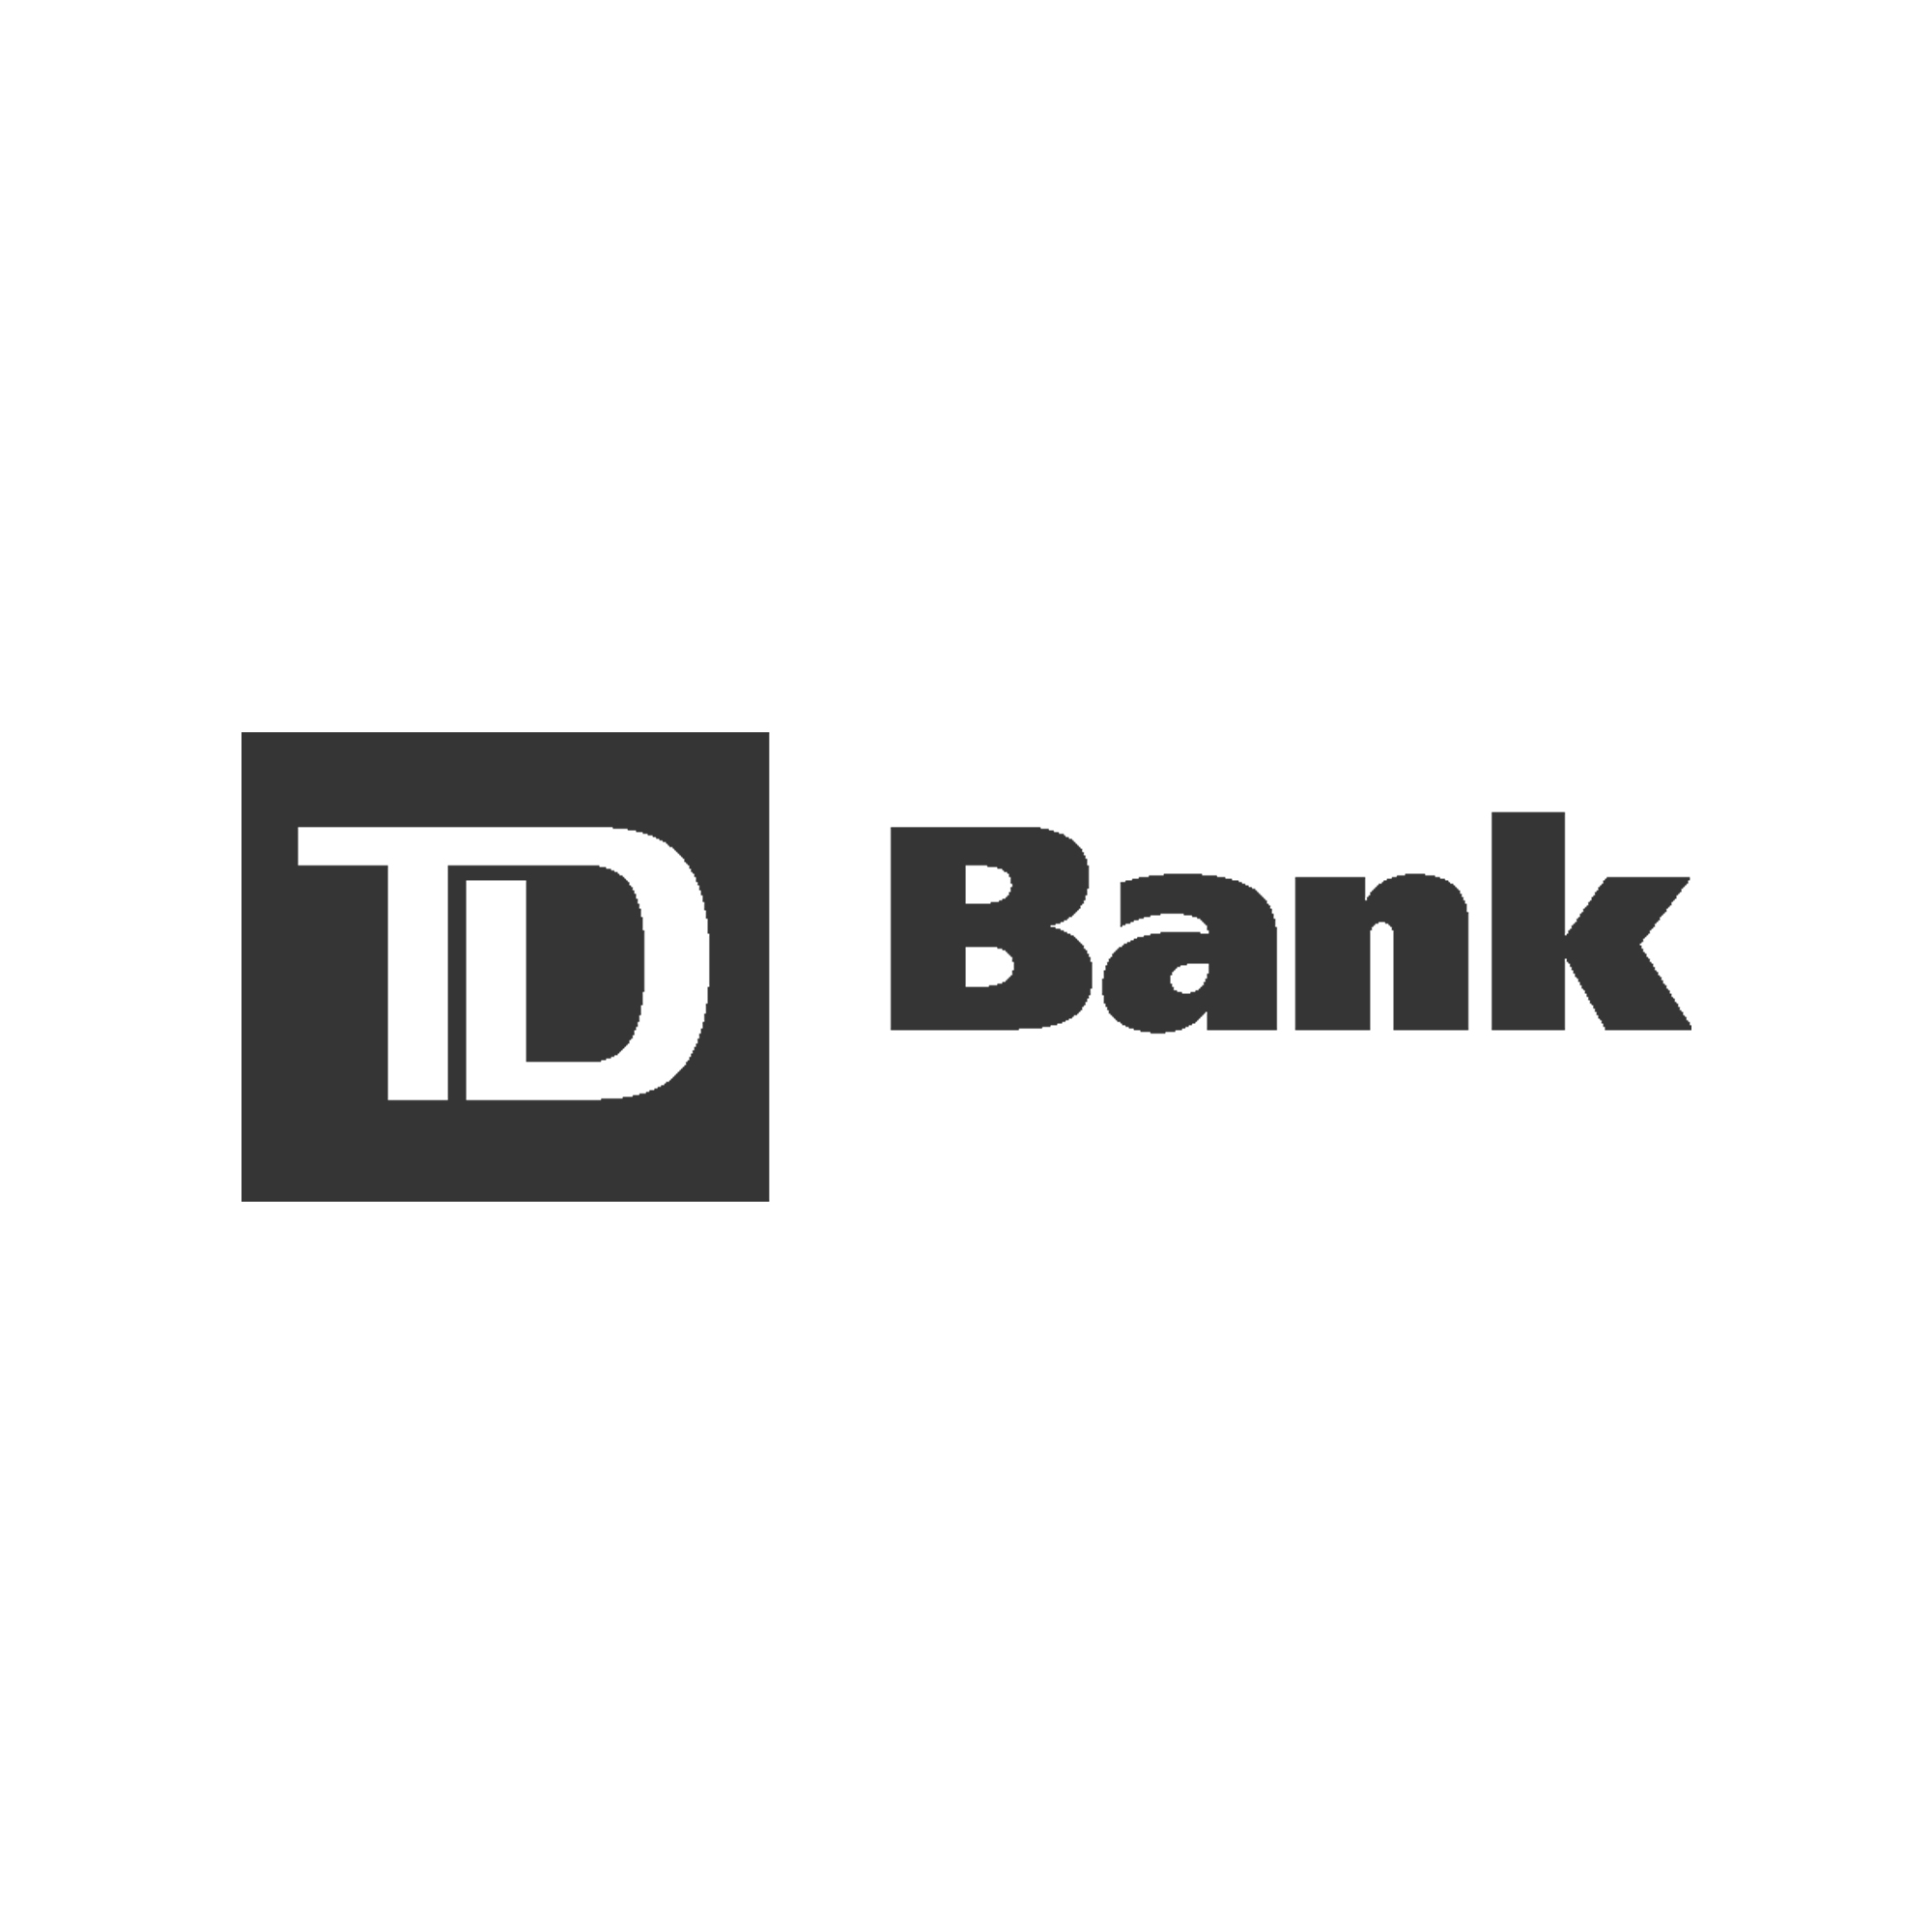 5_TD Bank.jpg